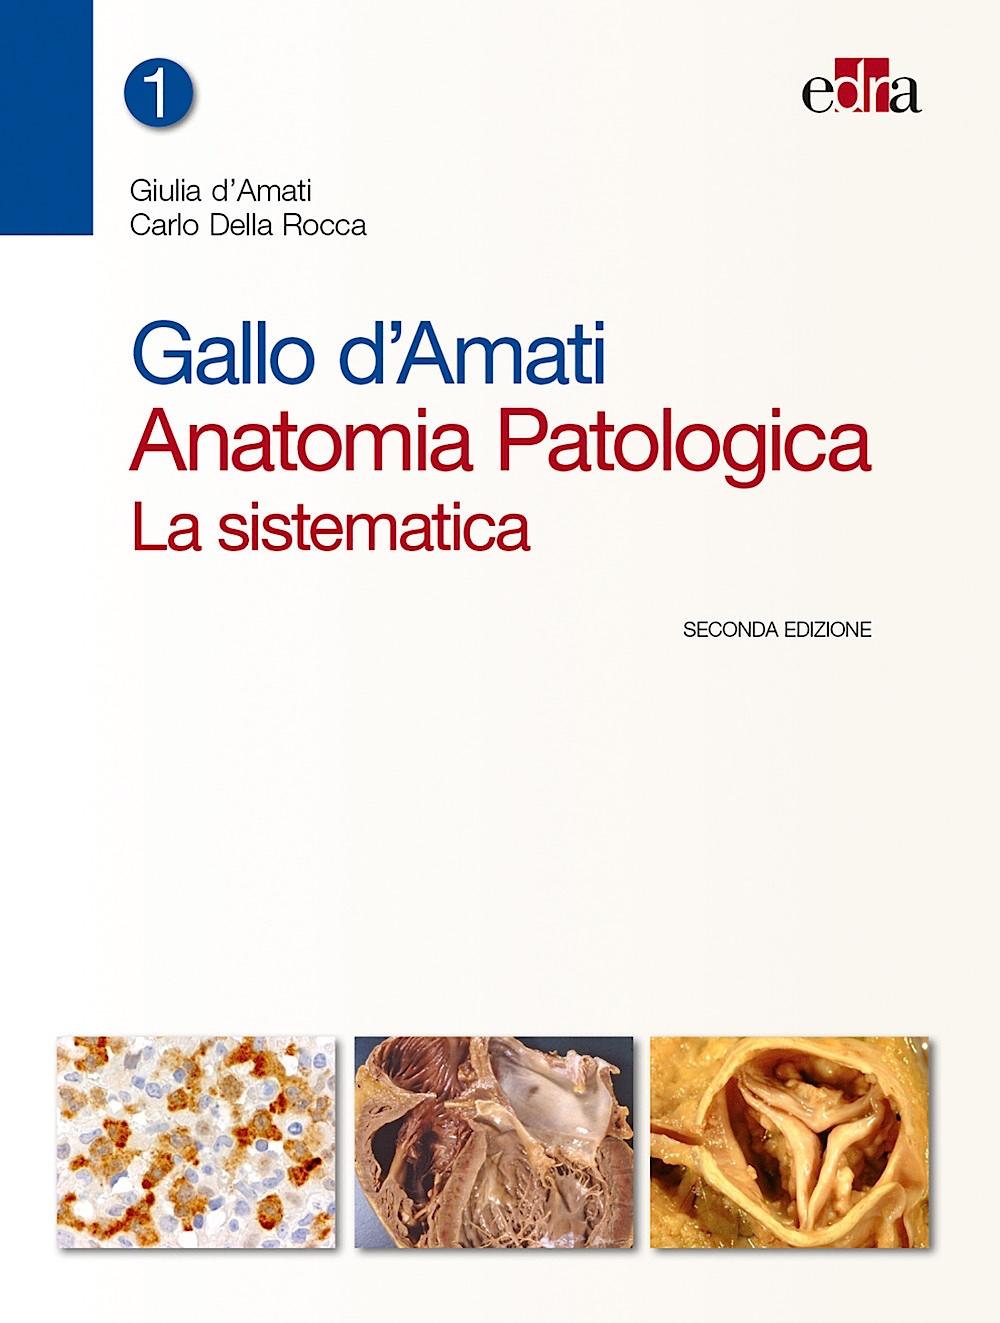 Anatomia patologica